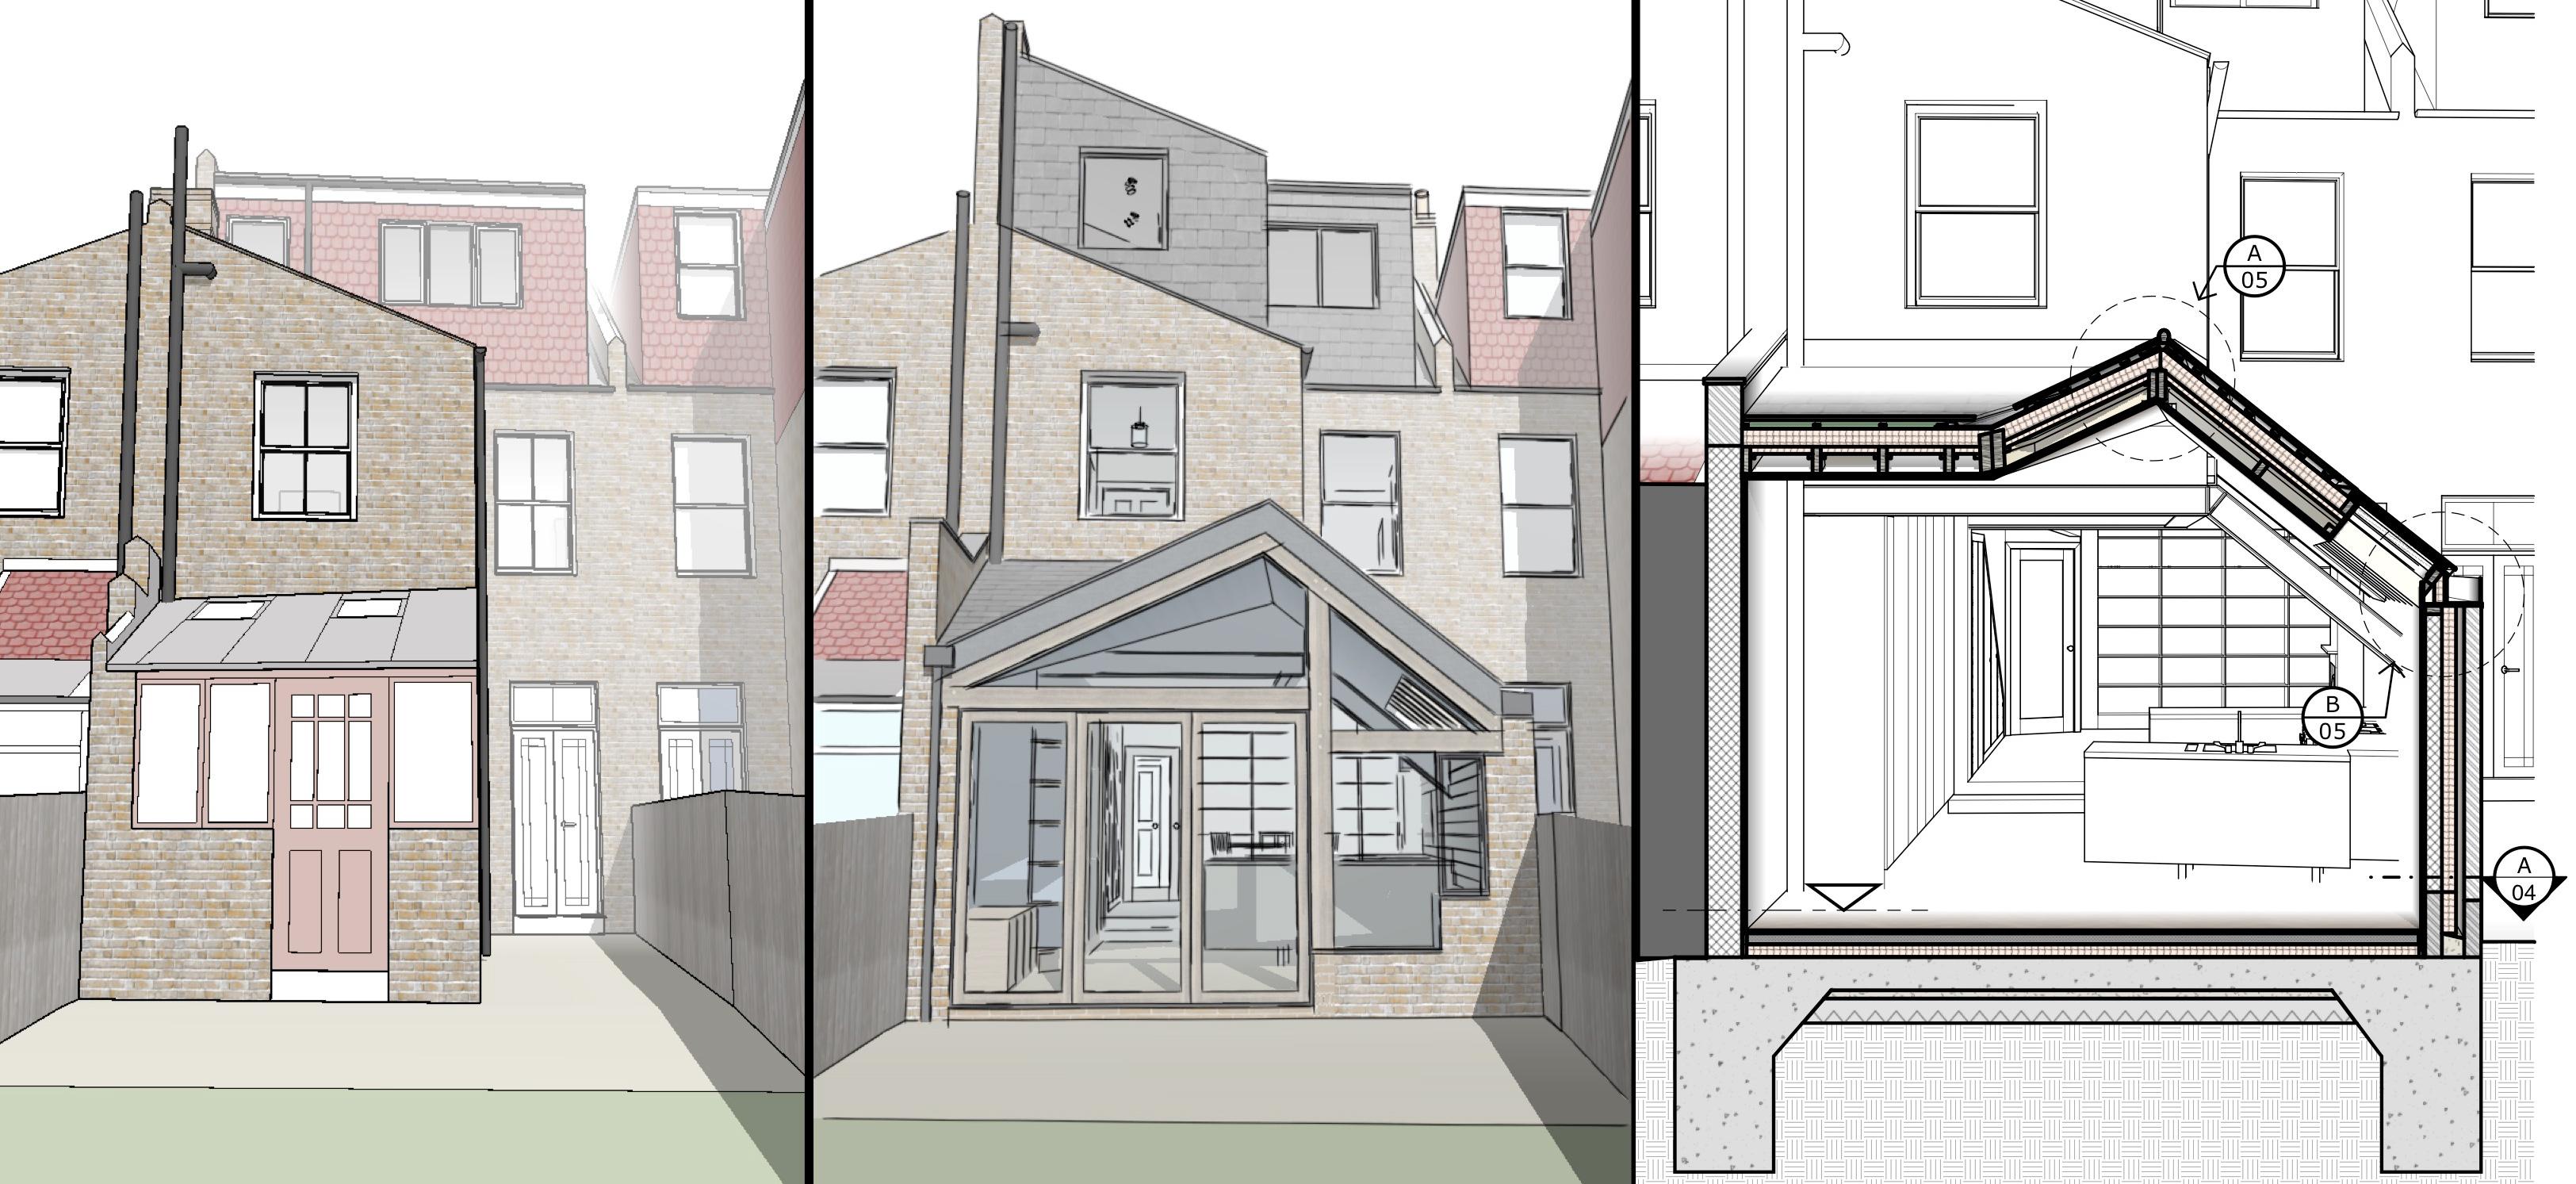 Drawn bulding  architecture design Build Kaneko Design Build in